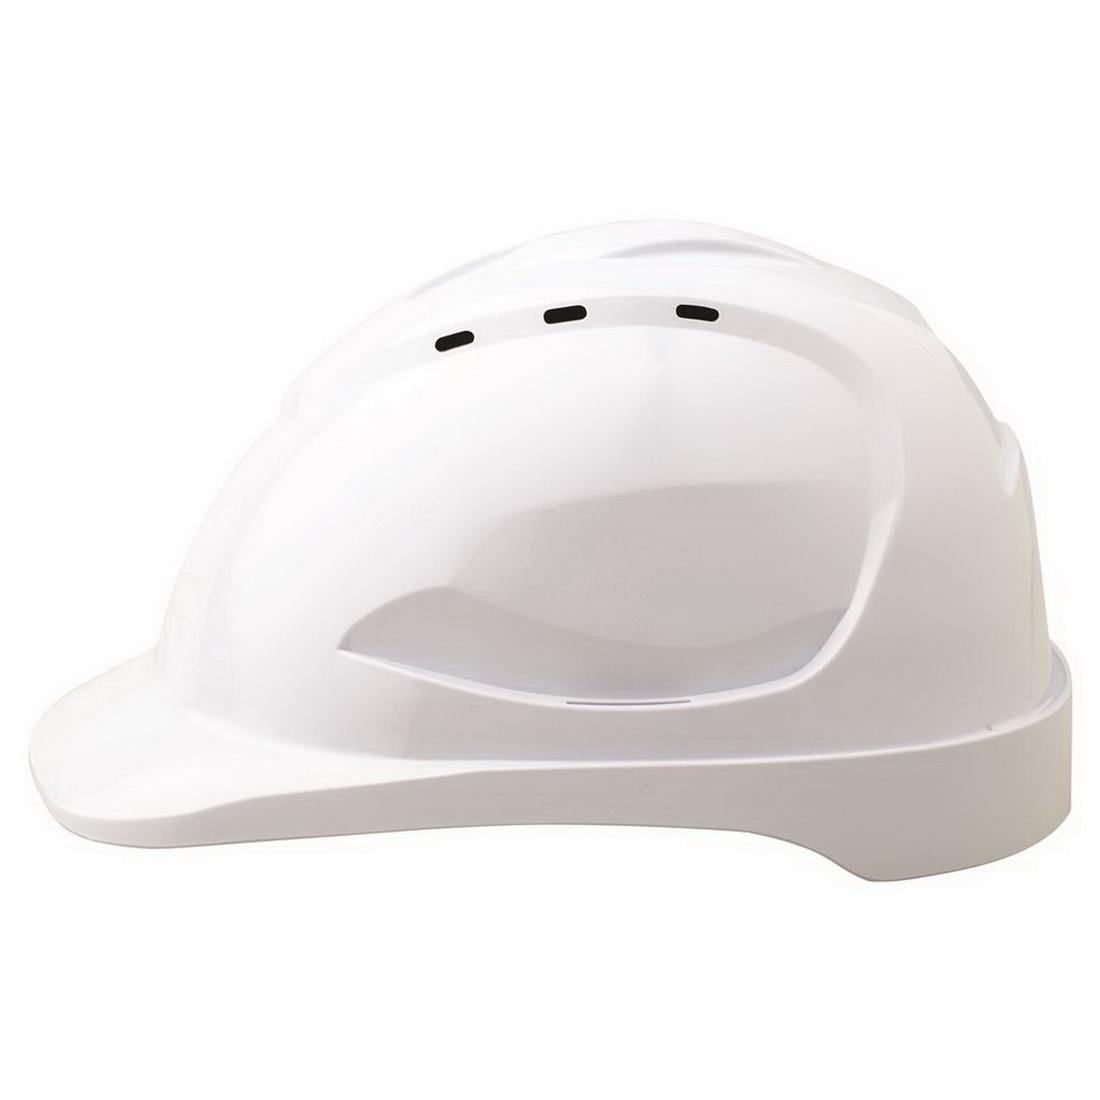 V9 Hard Hat Vented Pushlock Harness White